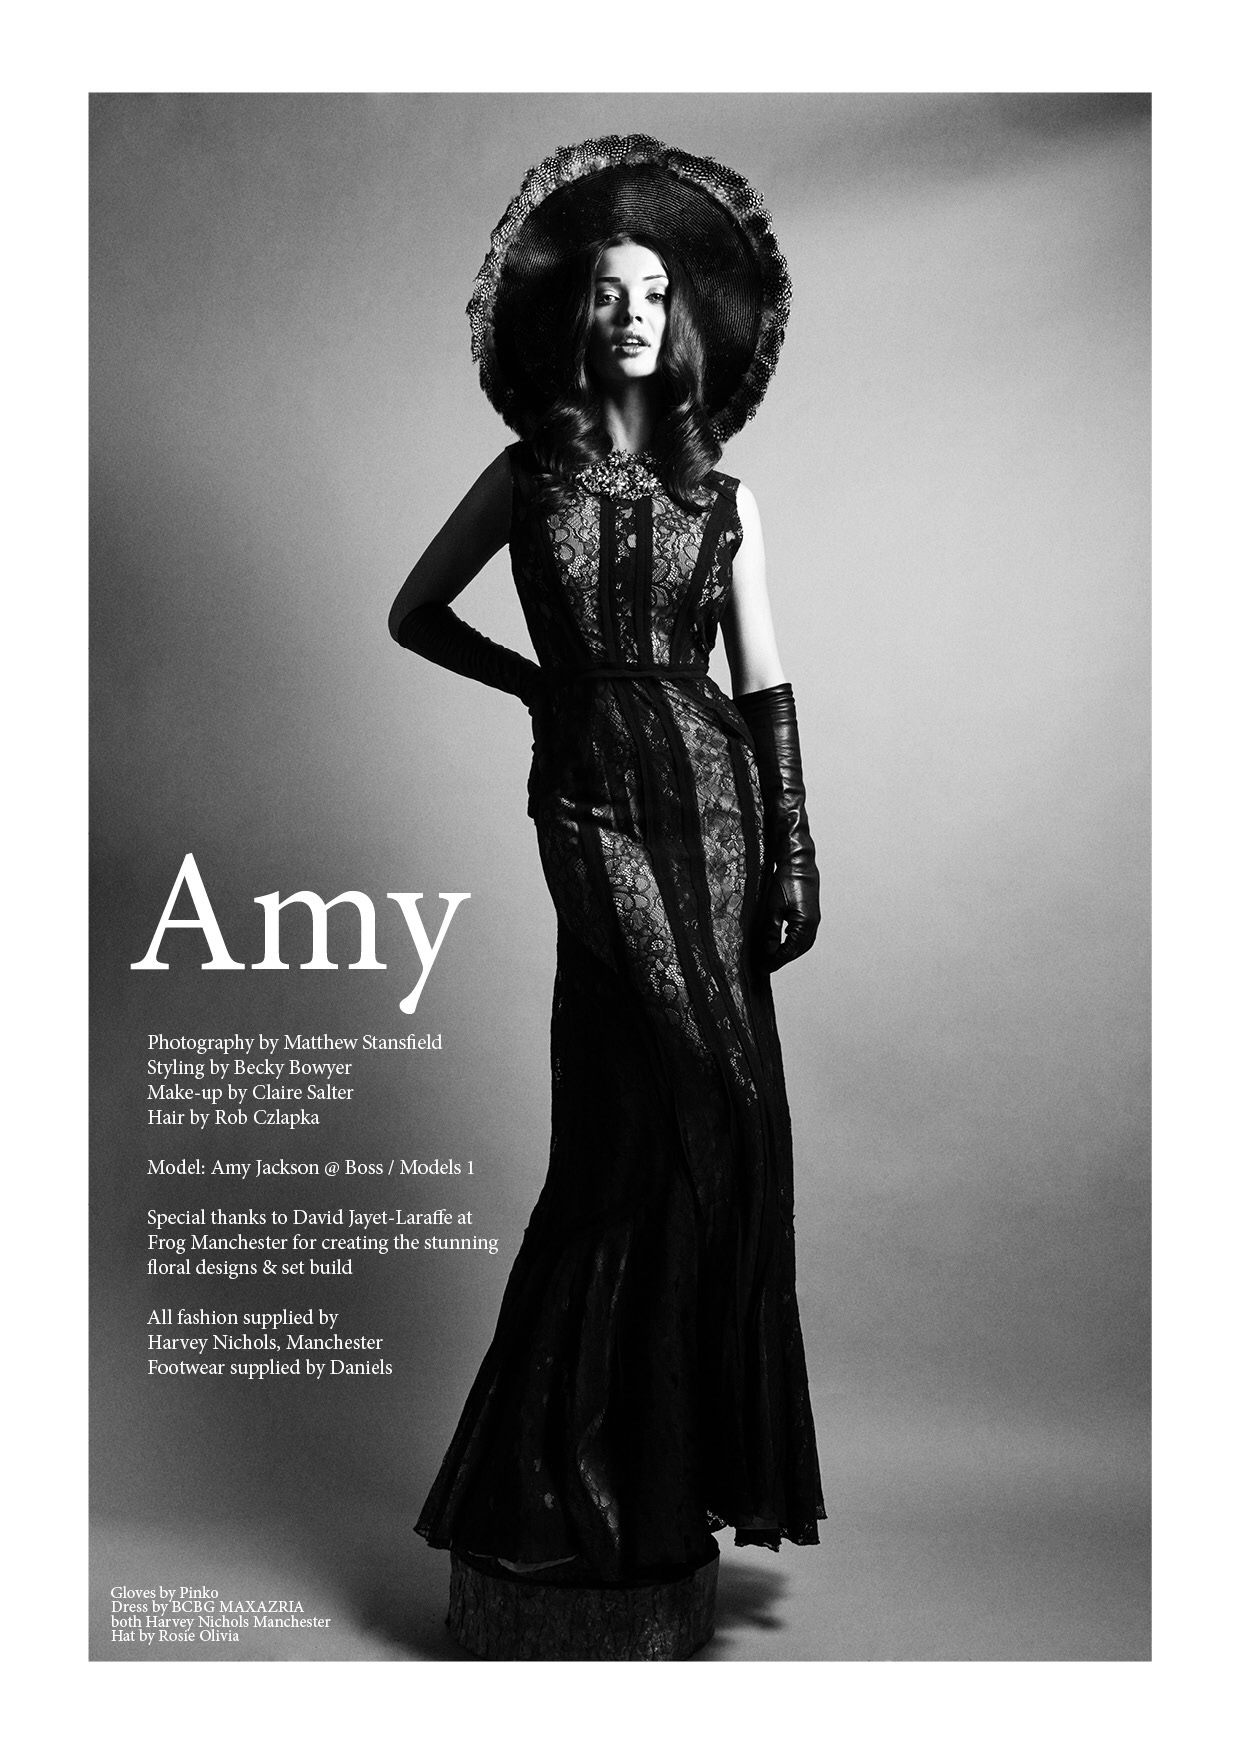 Amy-Jackson-Beauty-Rebel-Matthew-Stansfield-Photographer